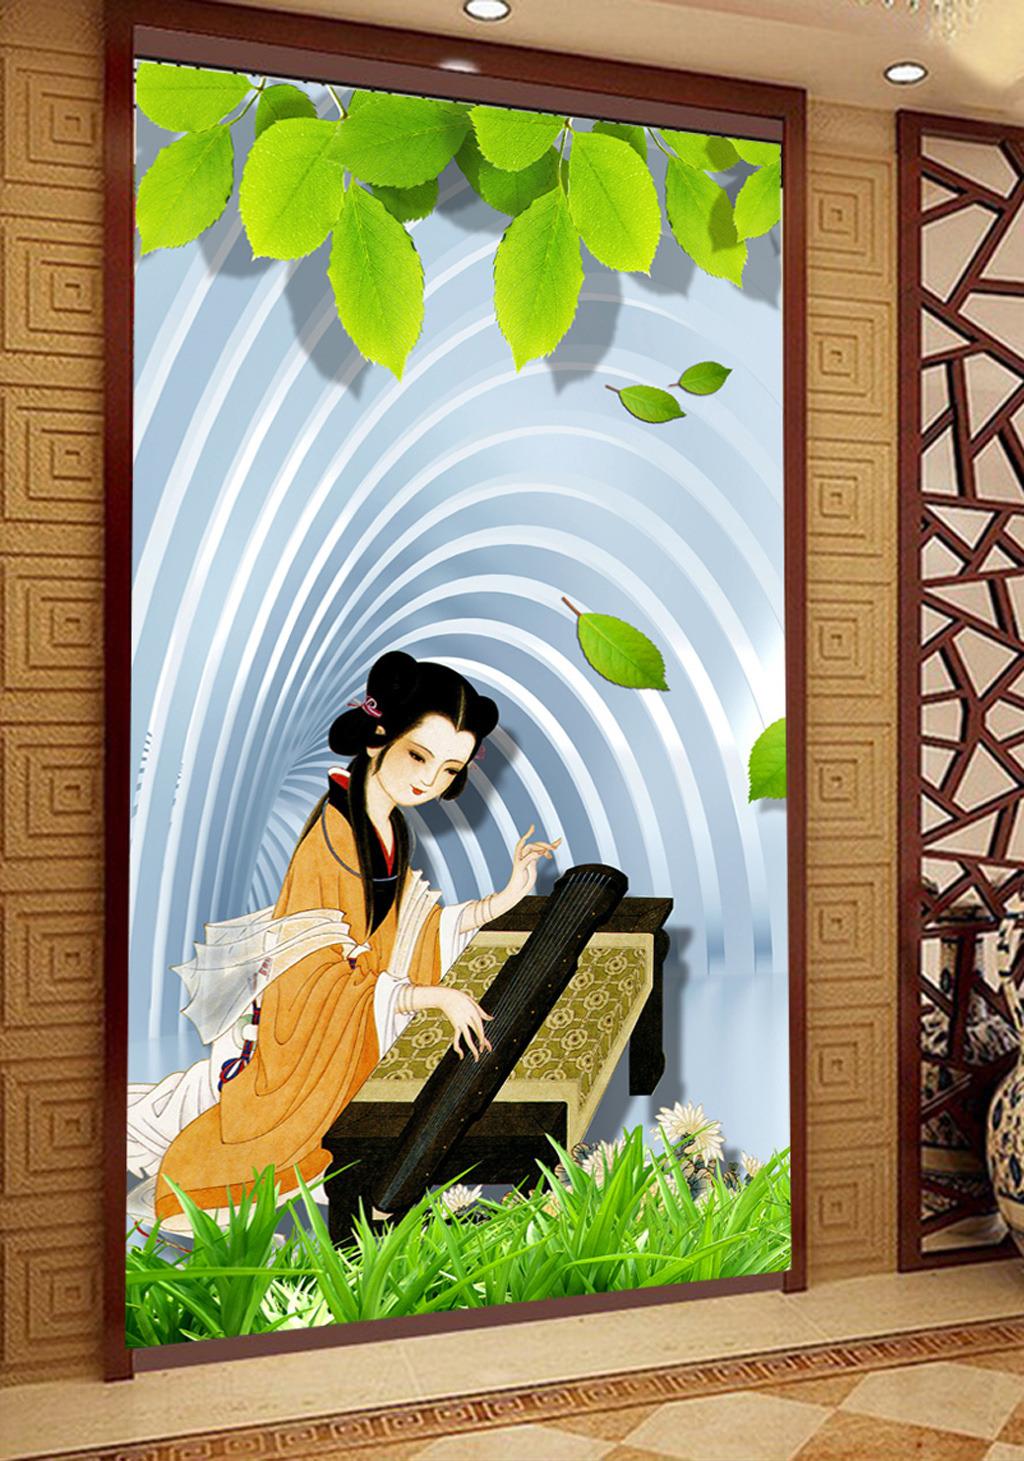 3d立体古代美女仕女图树叶效果玄关背景墙